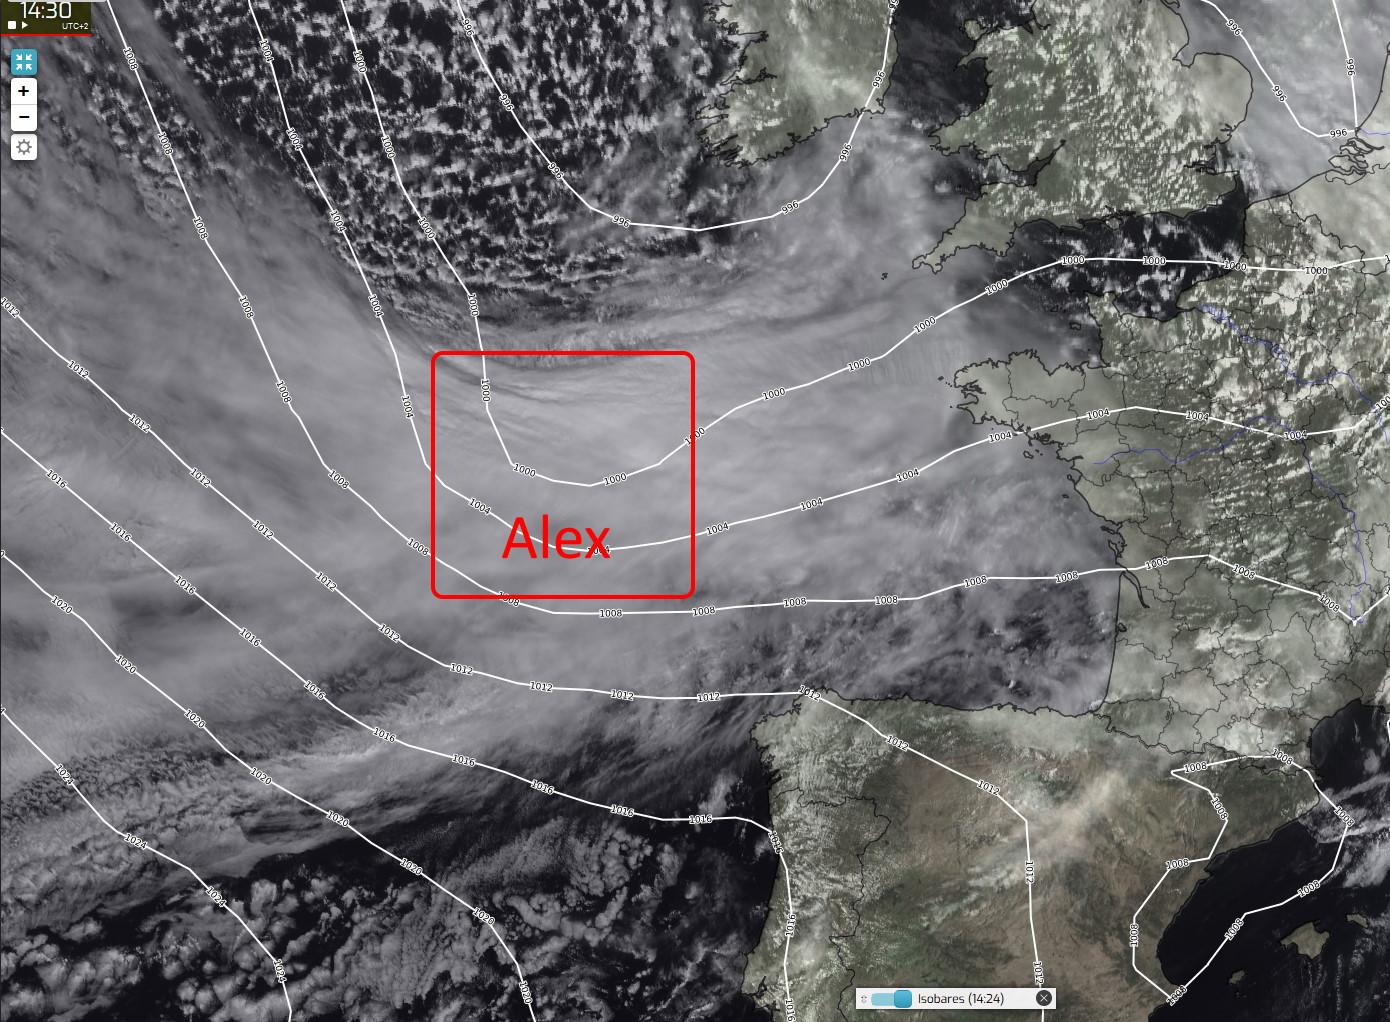 alex011015hjpg.jpg